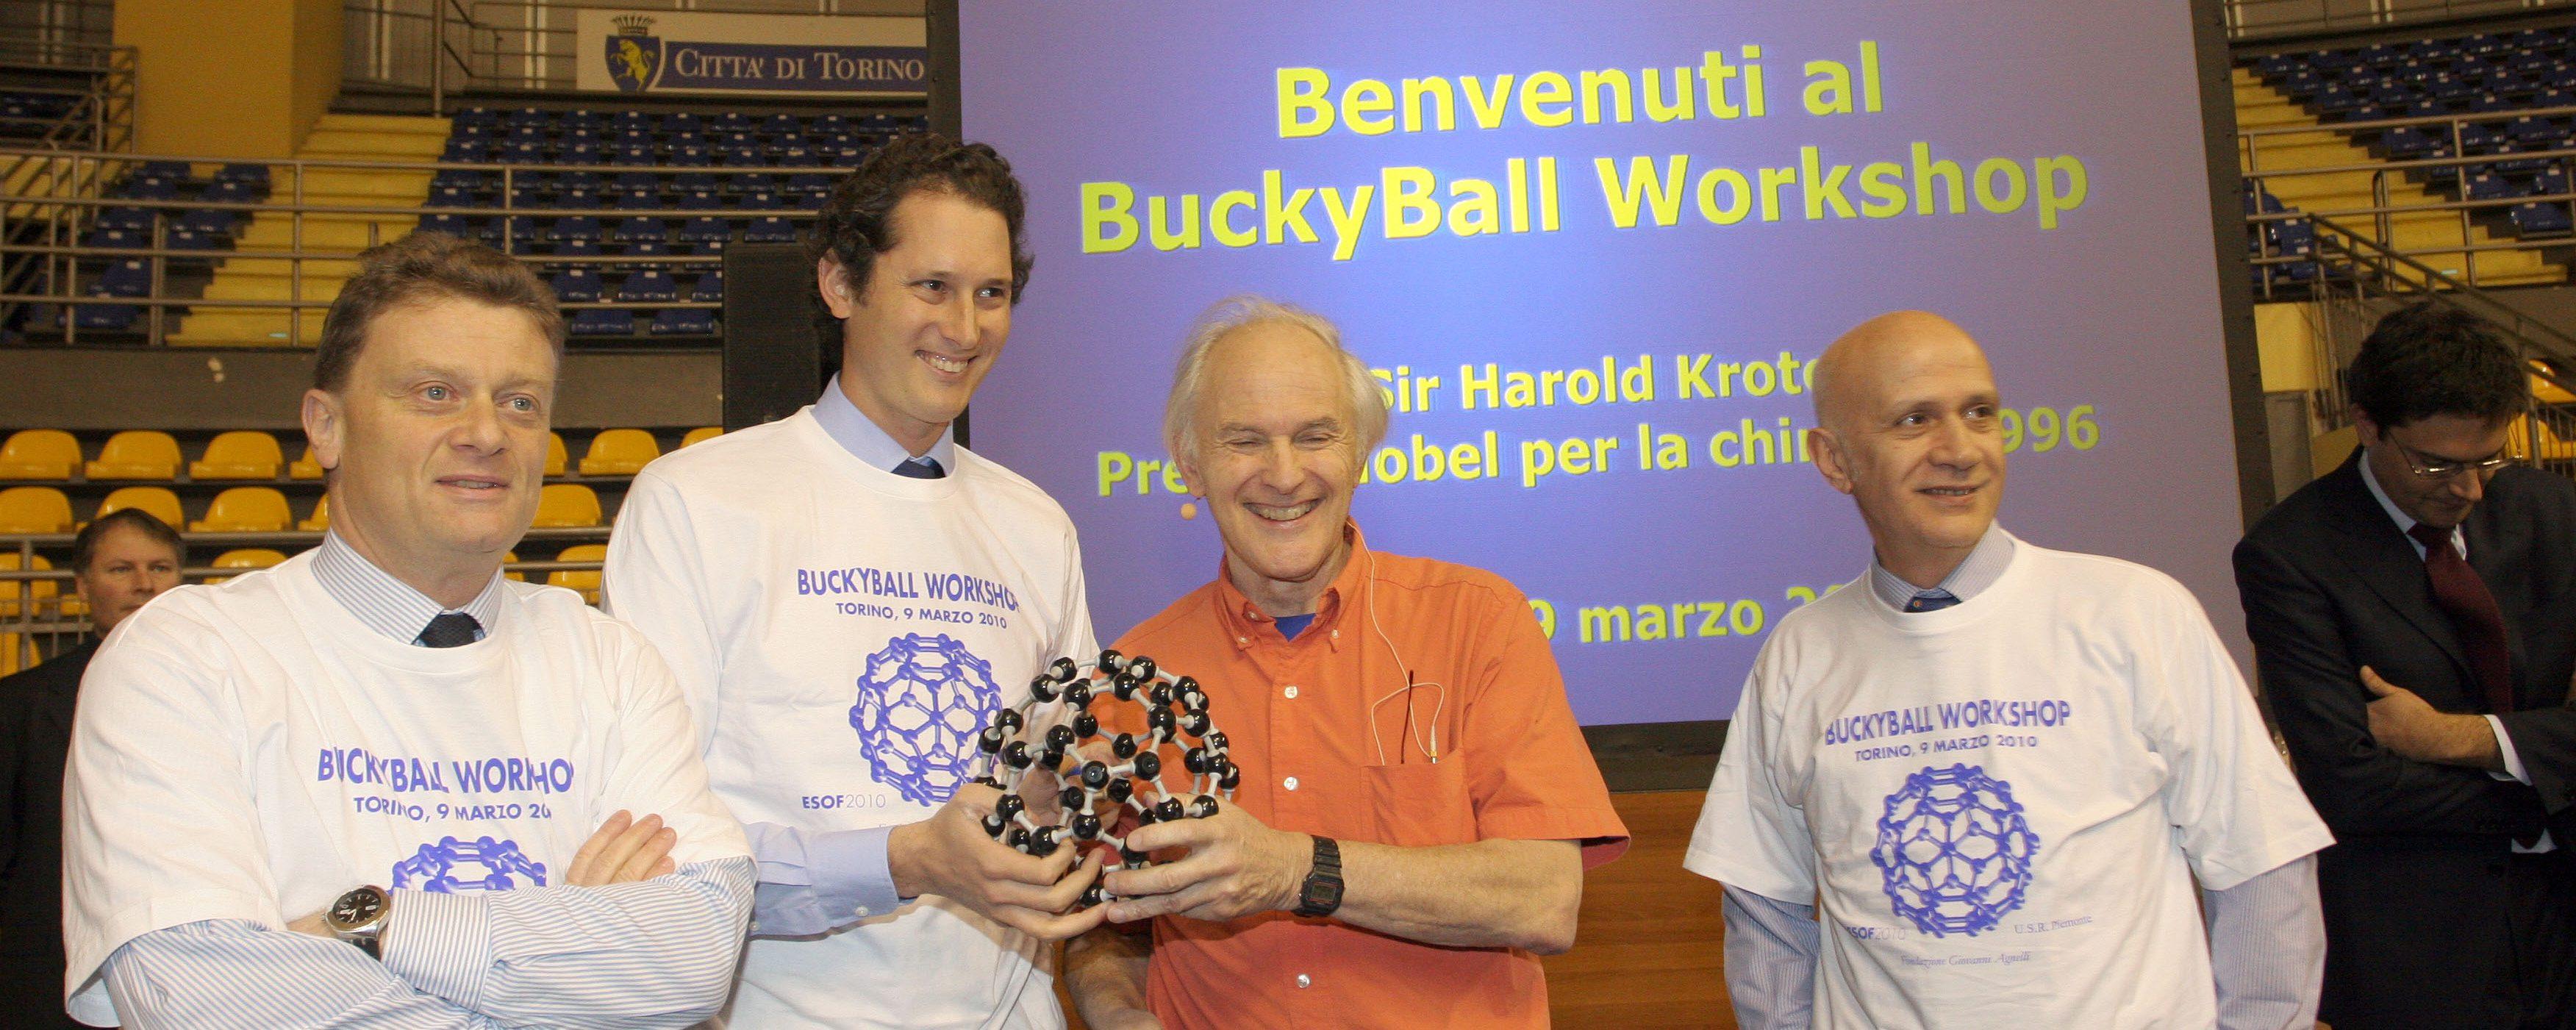 Buckyball Workshop. Le scuole del Piemonte giocano con la grande scienza